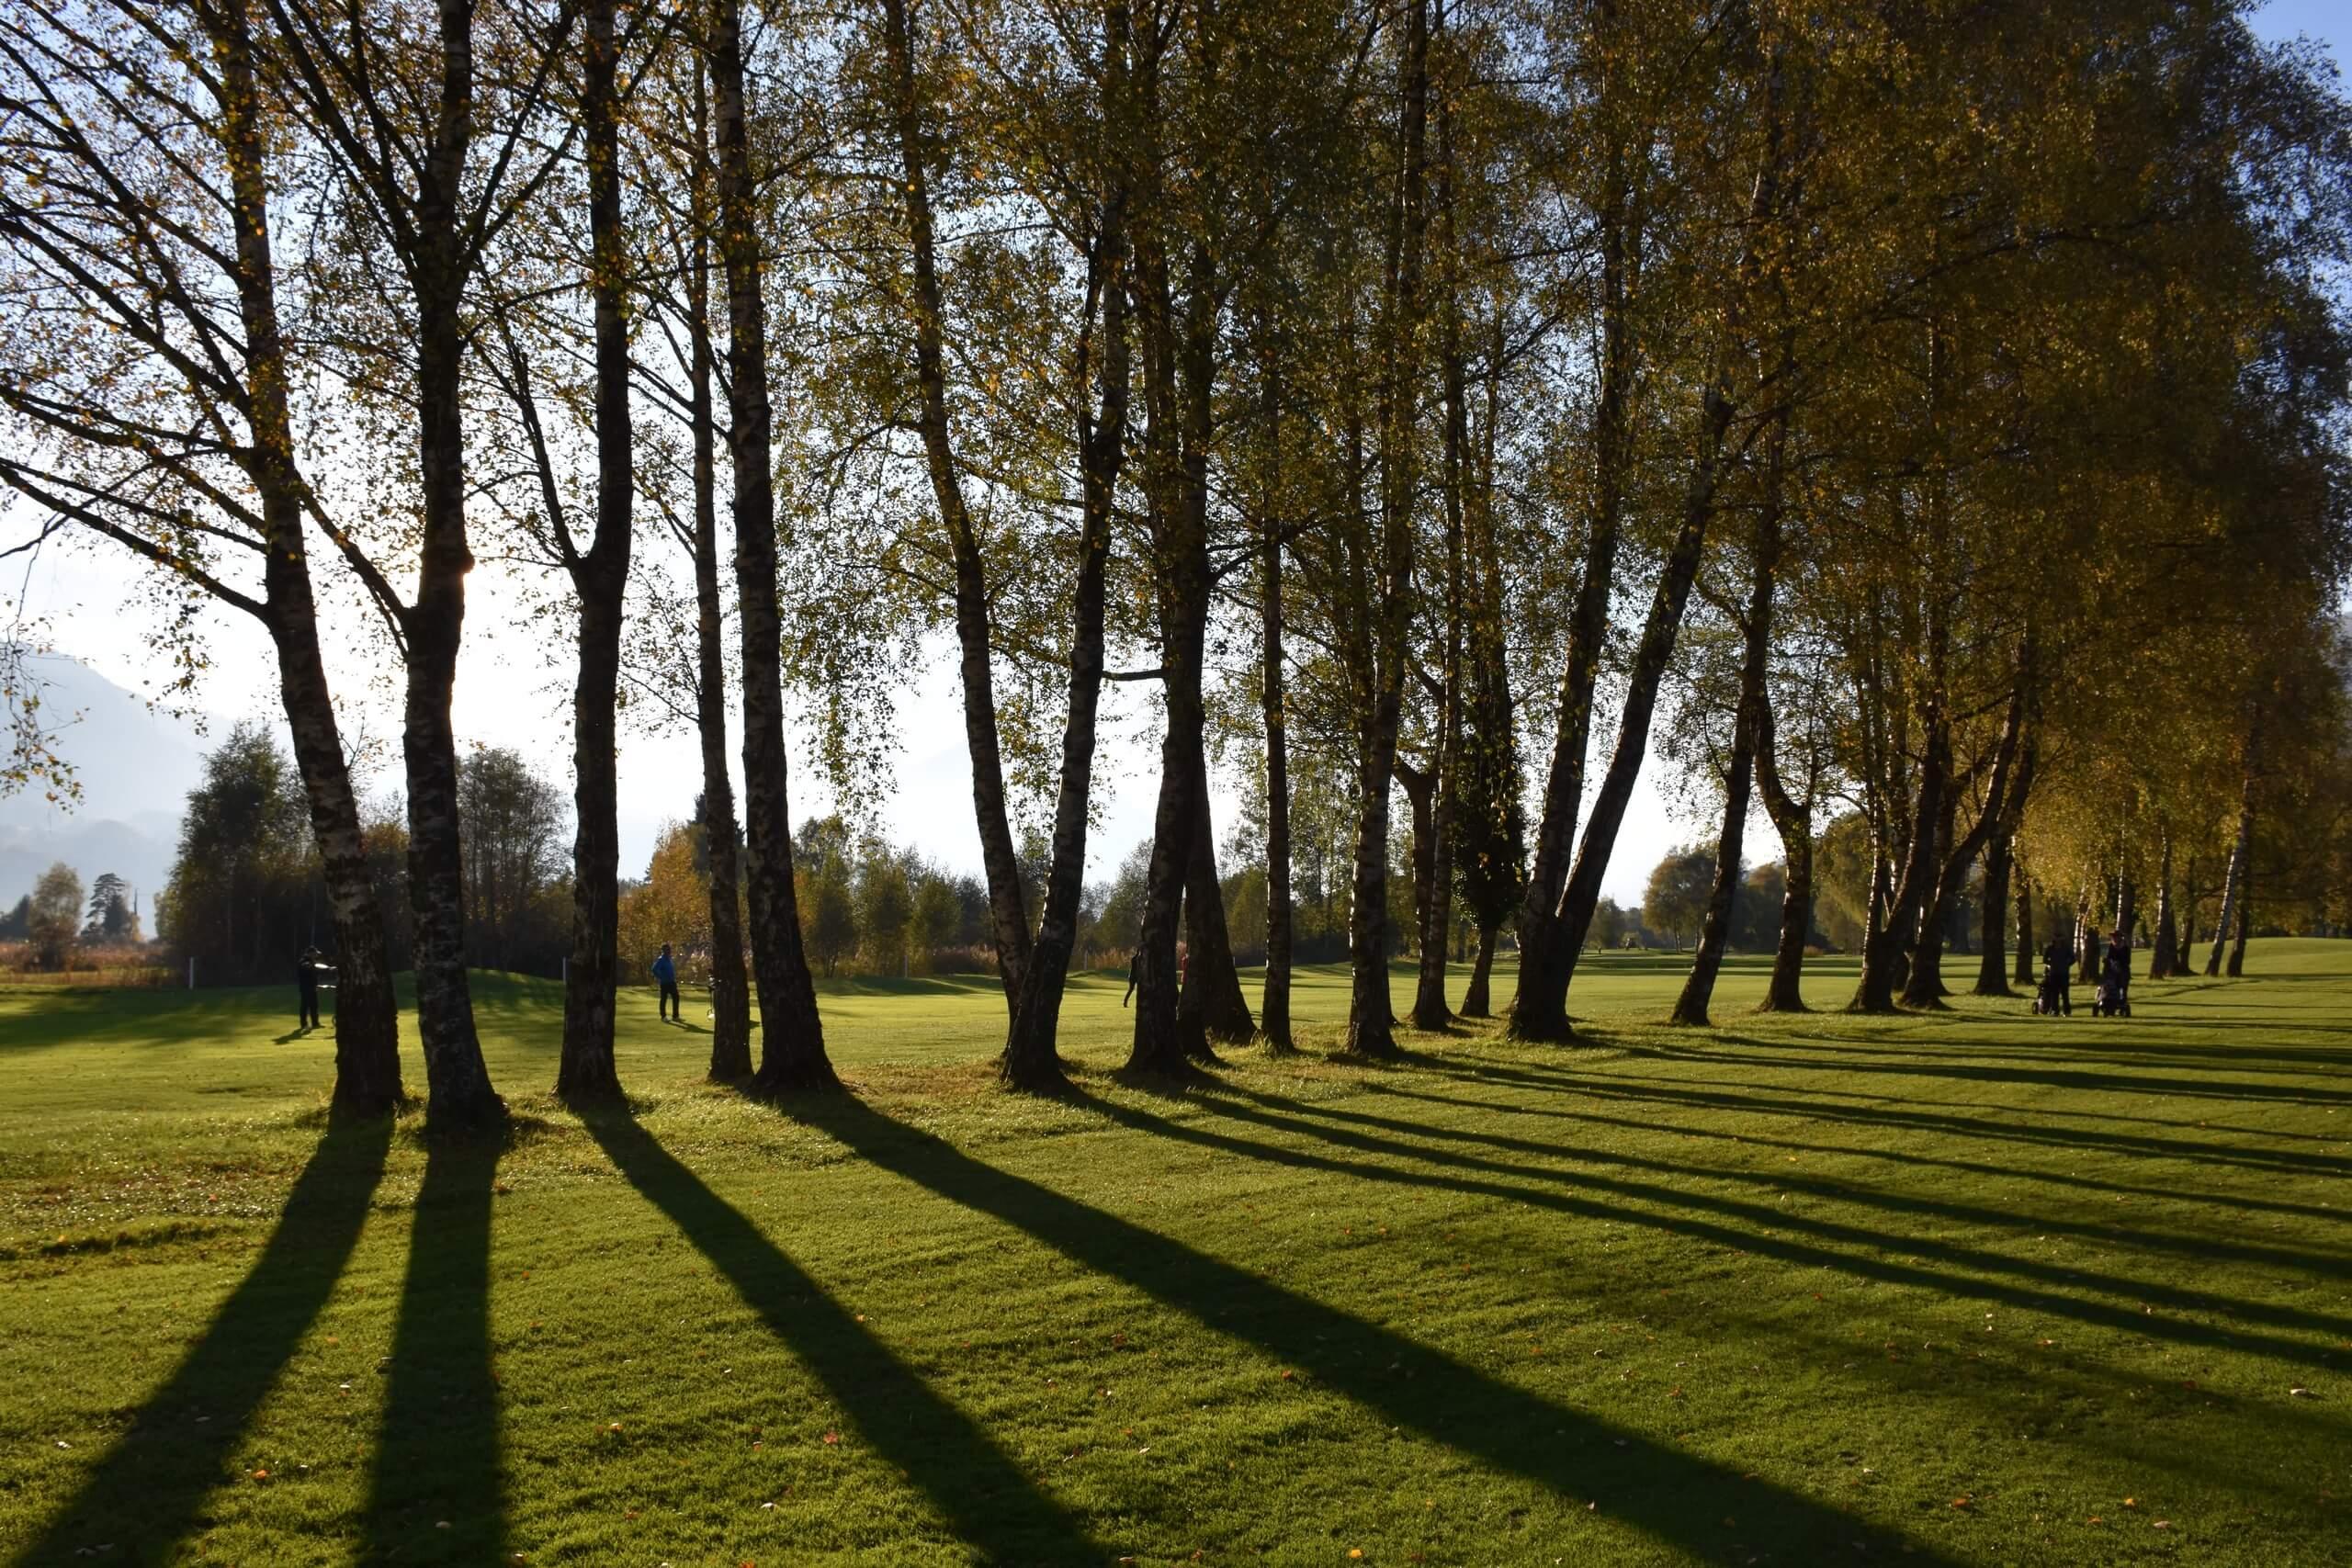 unterseen-golfplatz-baeume-sommer